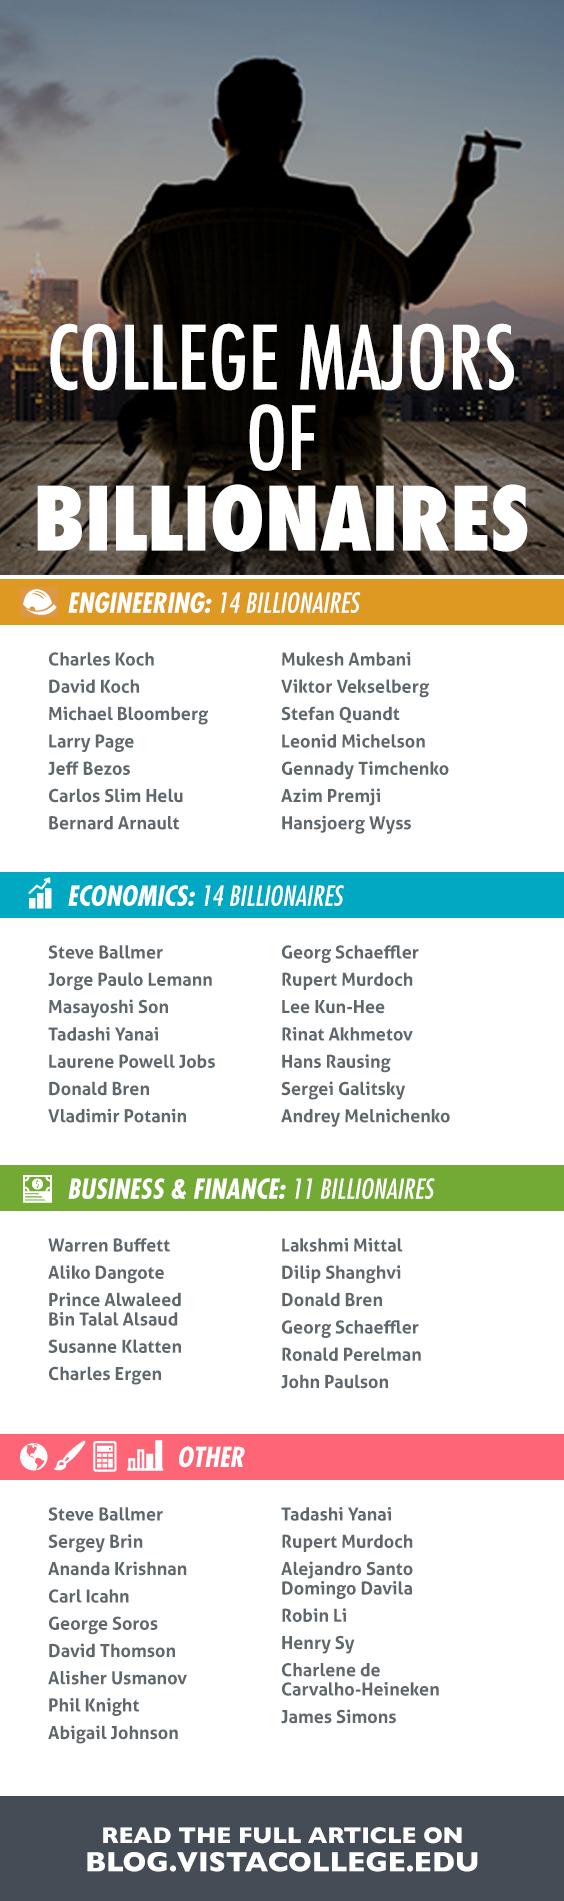 College Majors of Billionaires